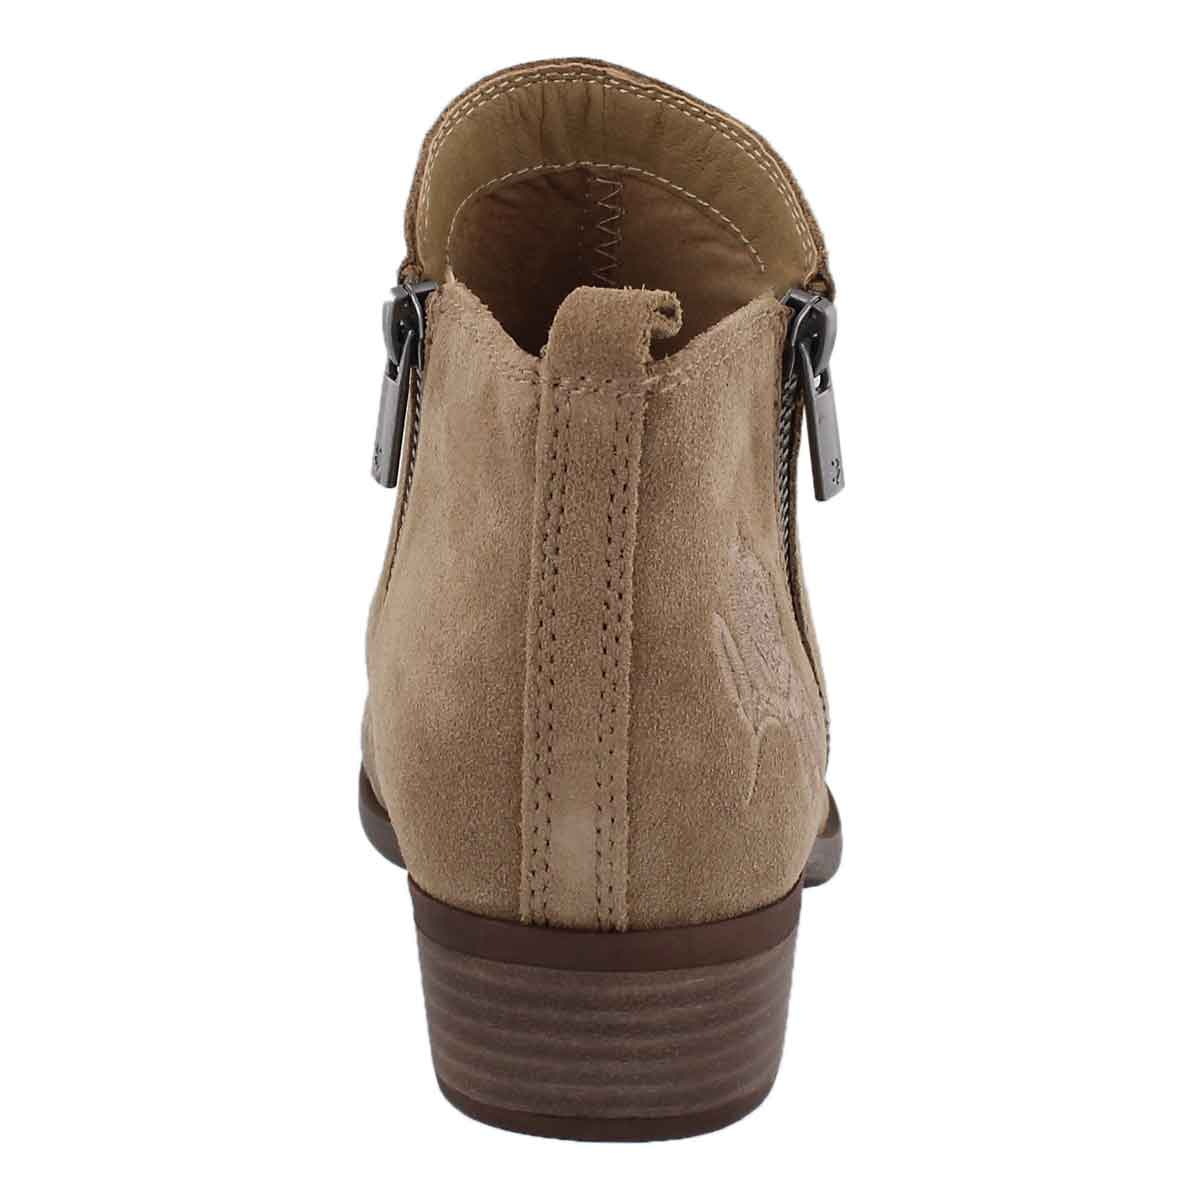 Lds Basel sesame zip up casual bootie